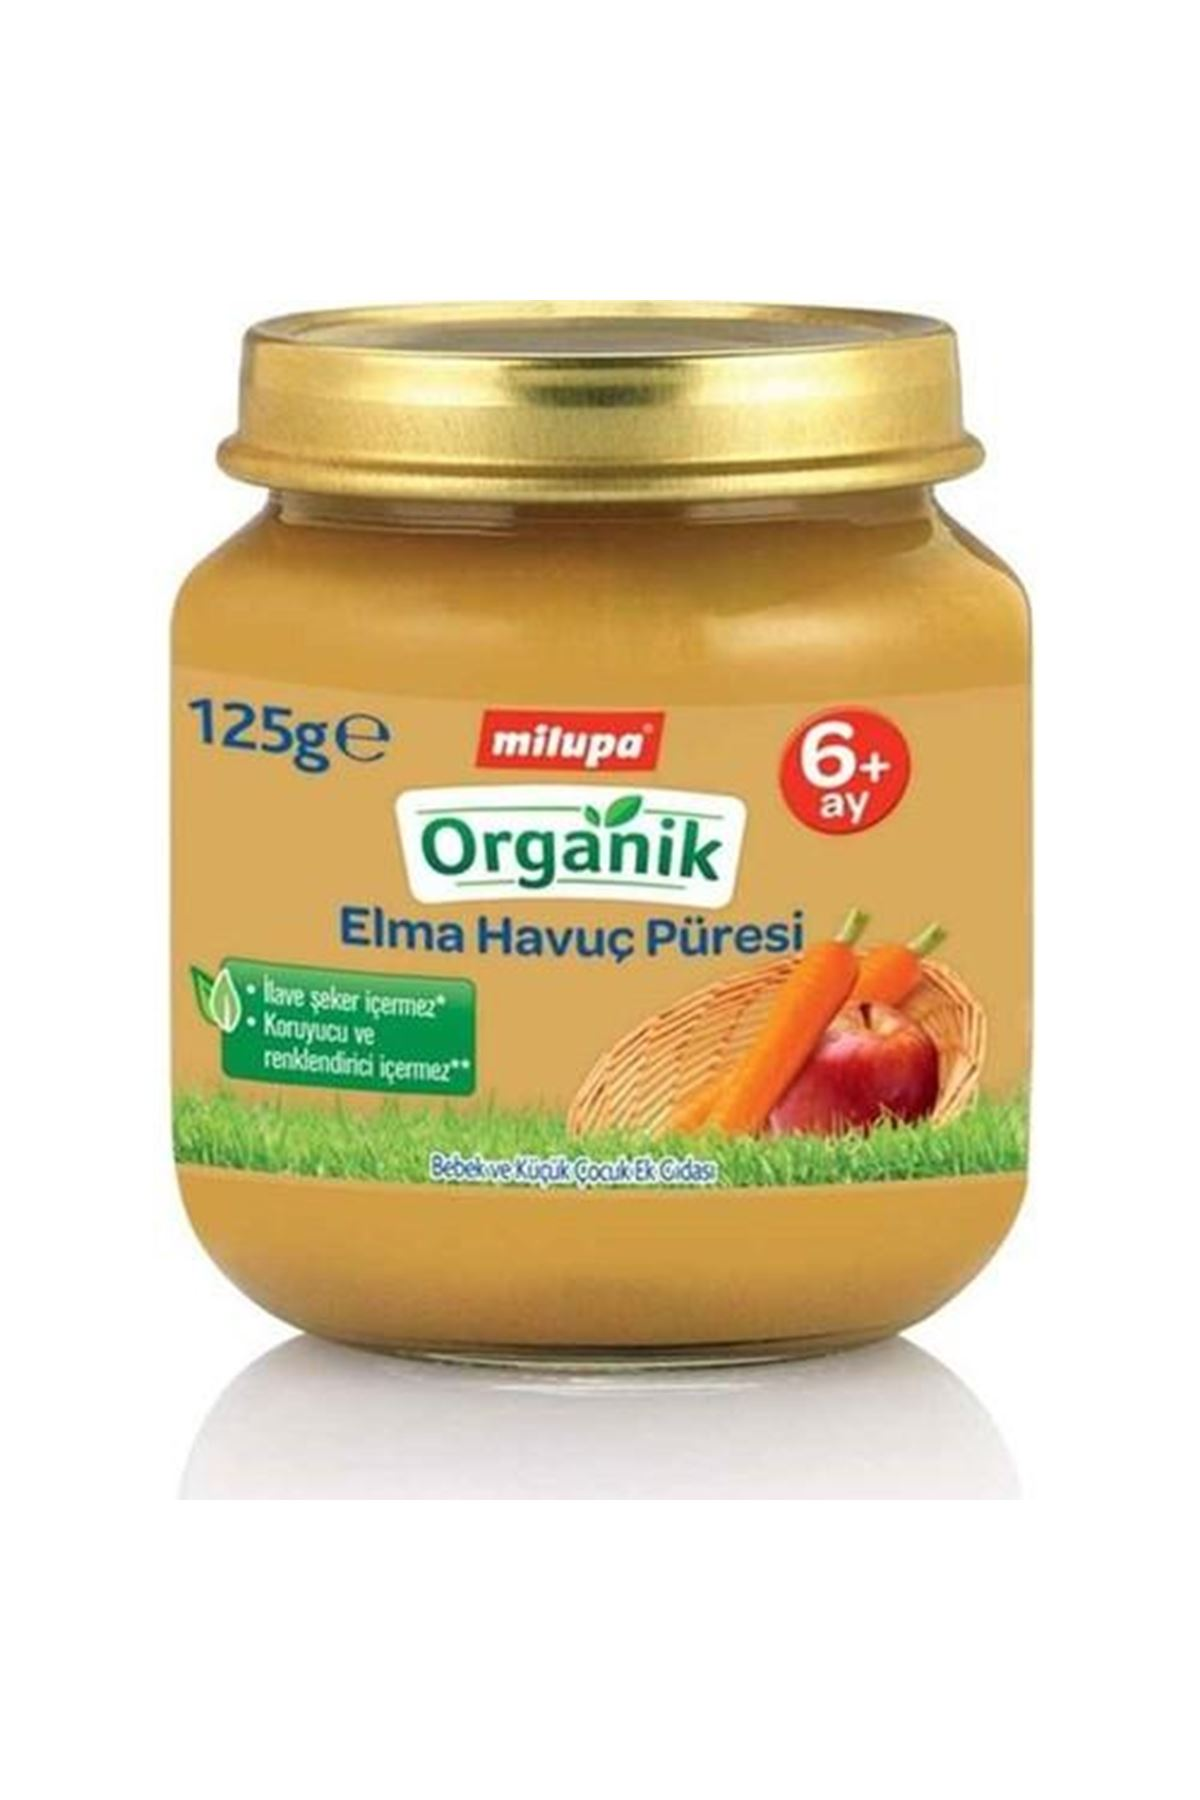 Milupa Organik Elma Havuç Püreli Kavanoz Maması 125 Gr